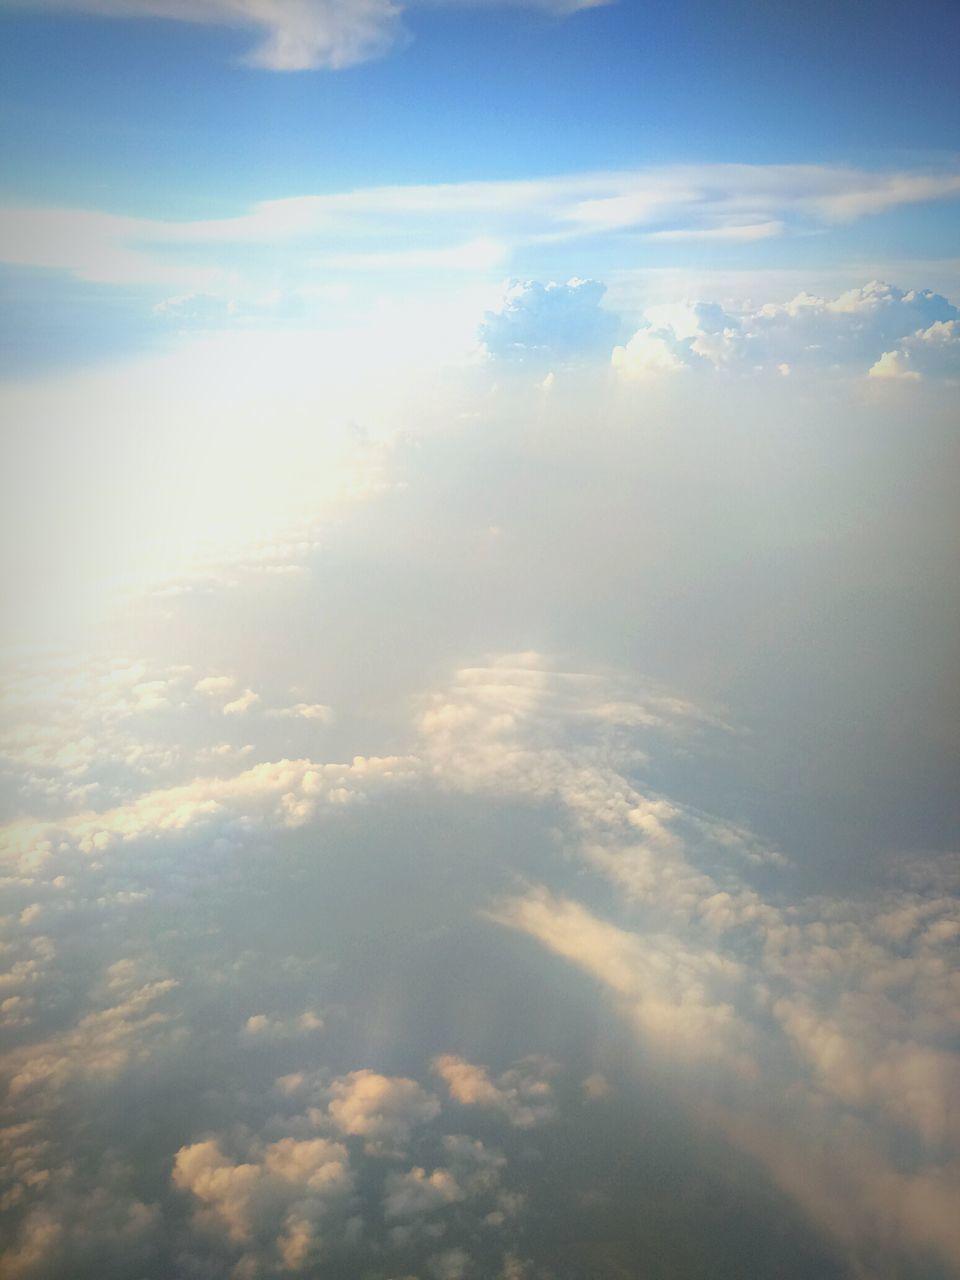 Aerial View Of Sea Of Clouds In Sky